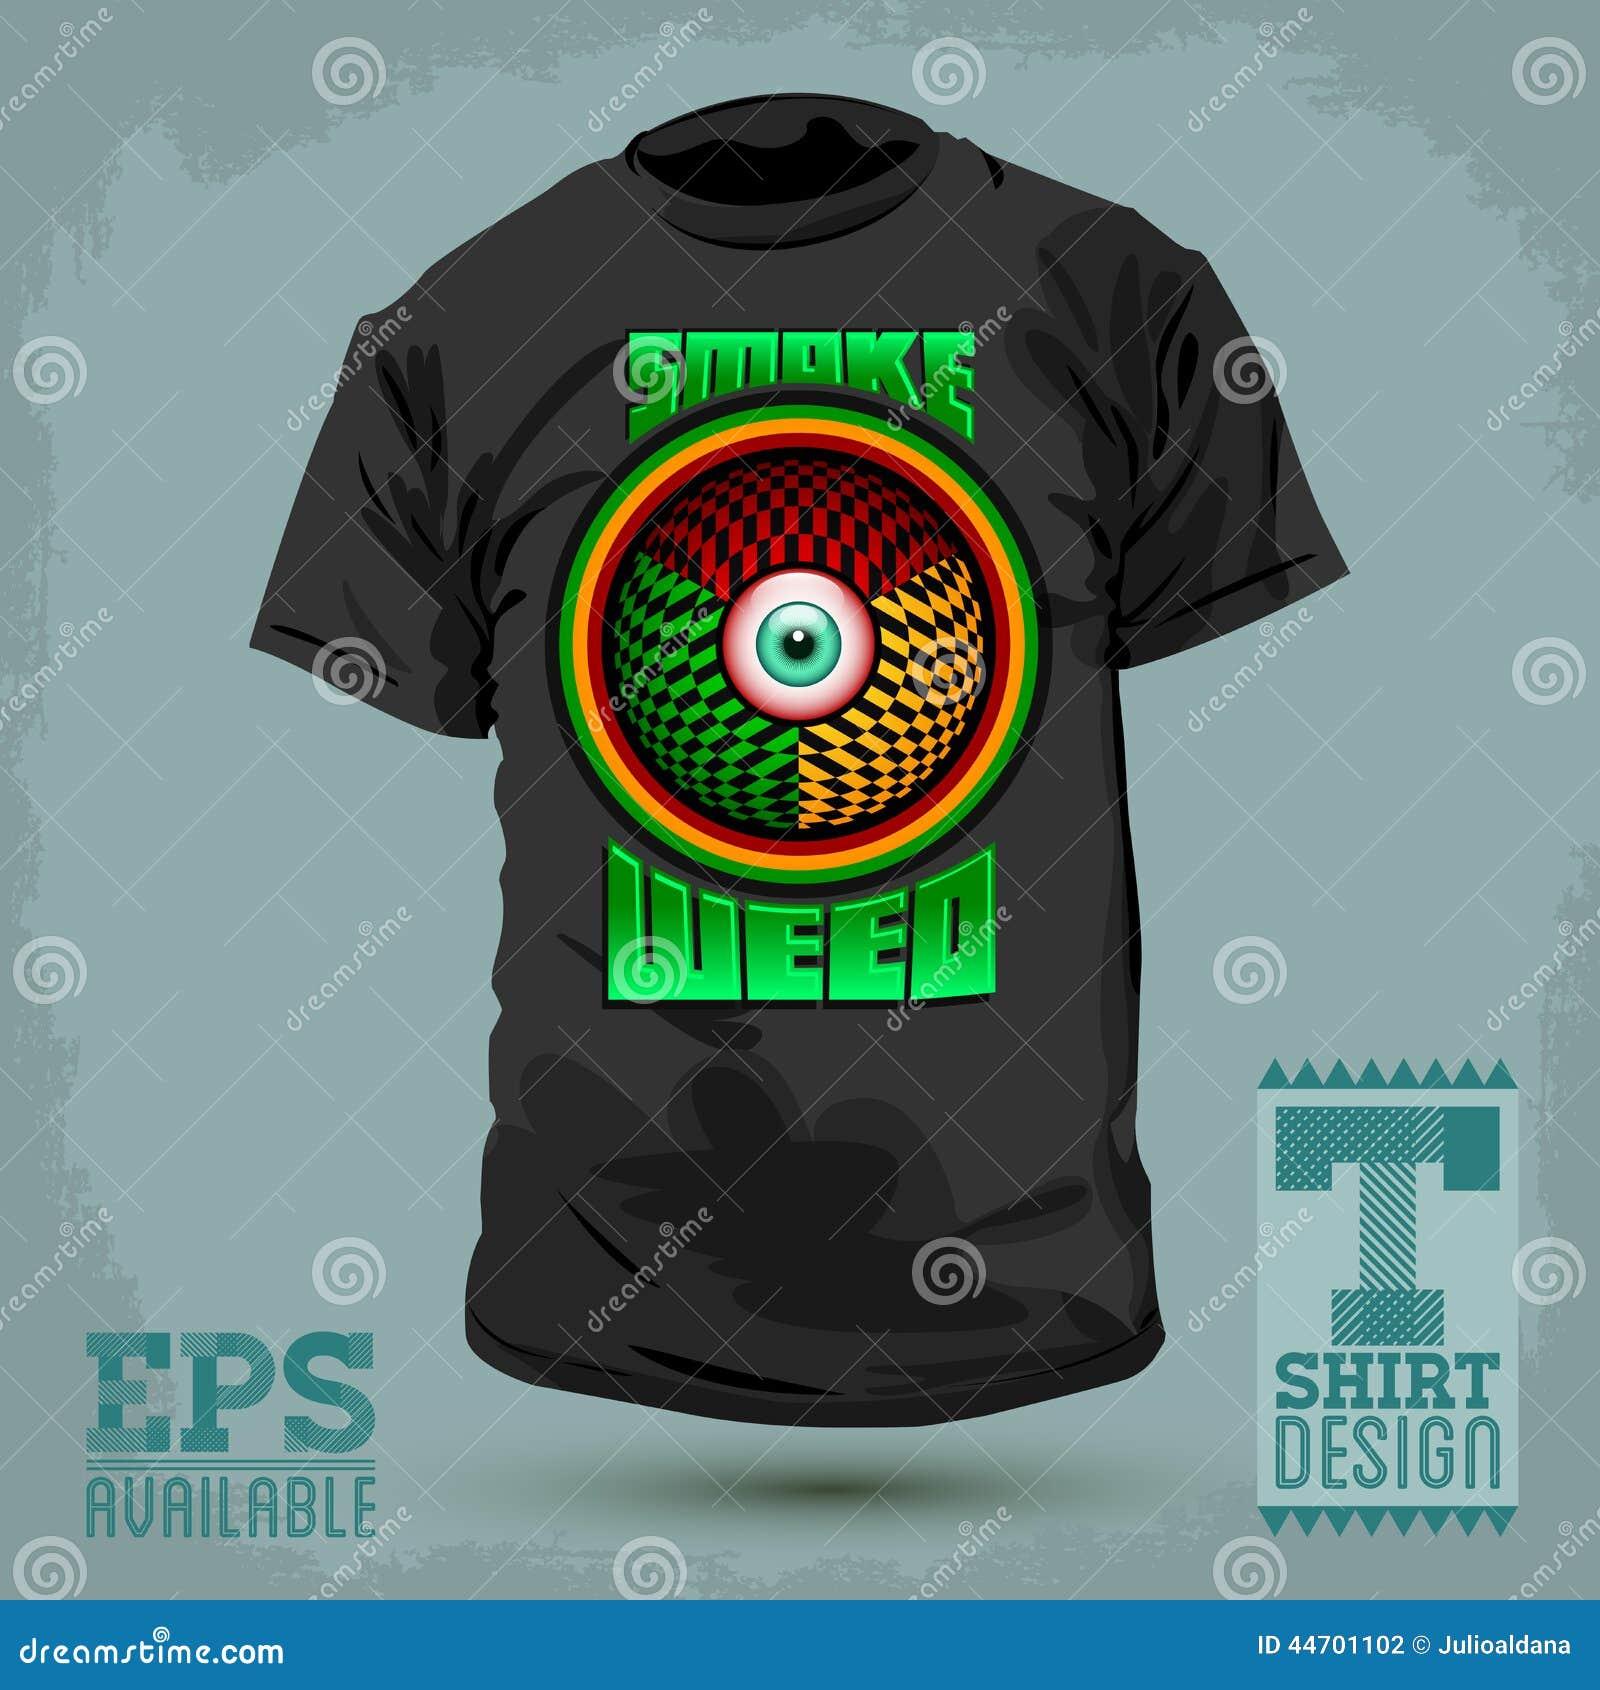 Shirt design red - Graphic T Shirt Design Smoke Weed Badge Red Eye Icon